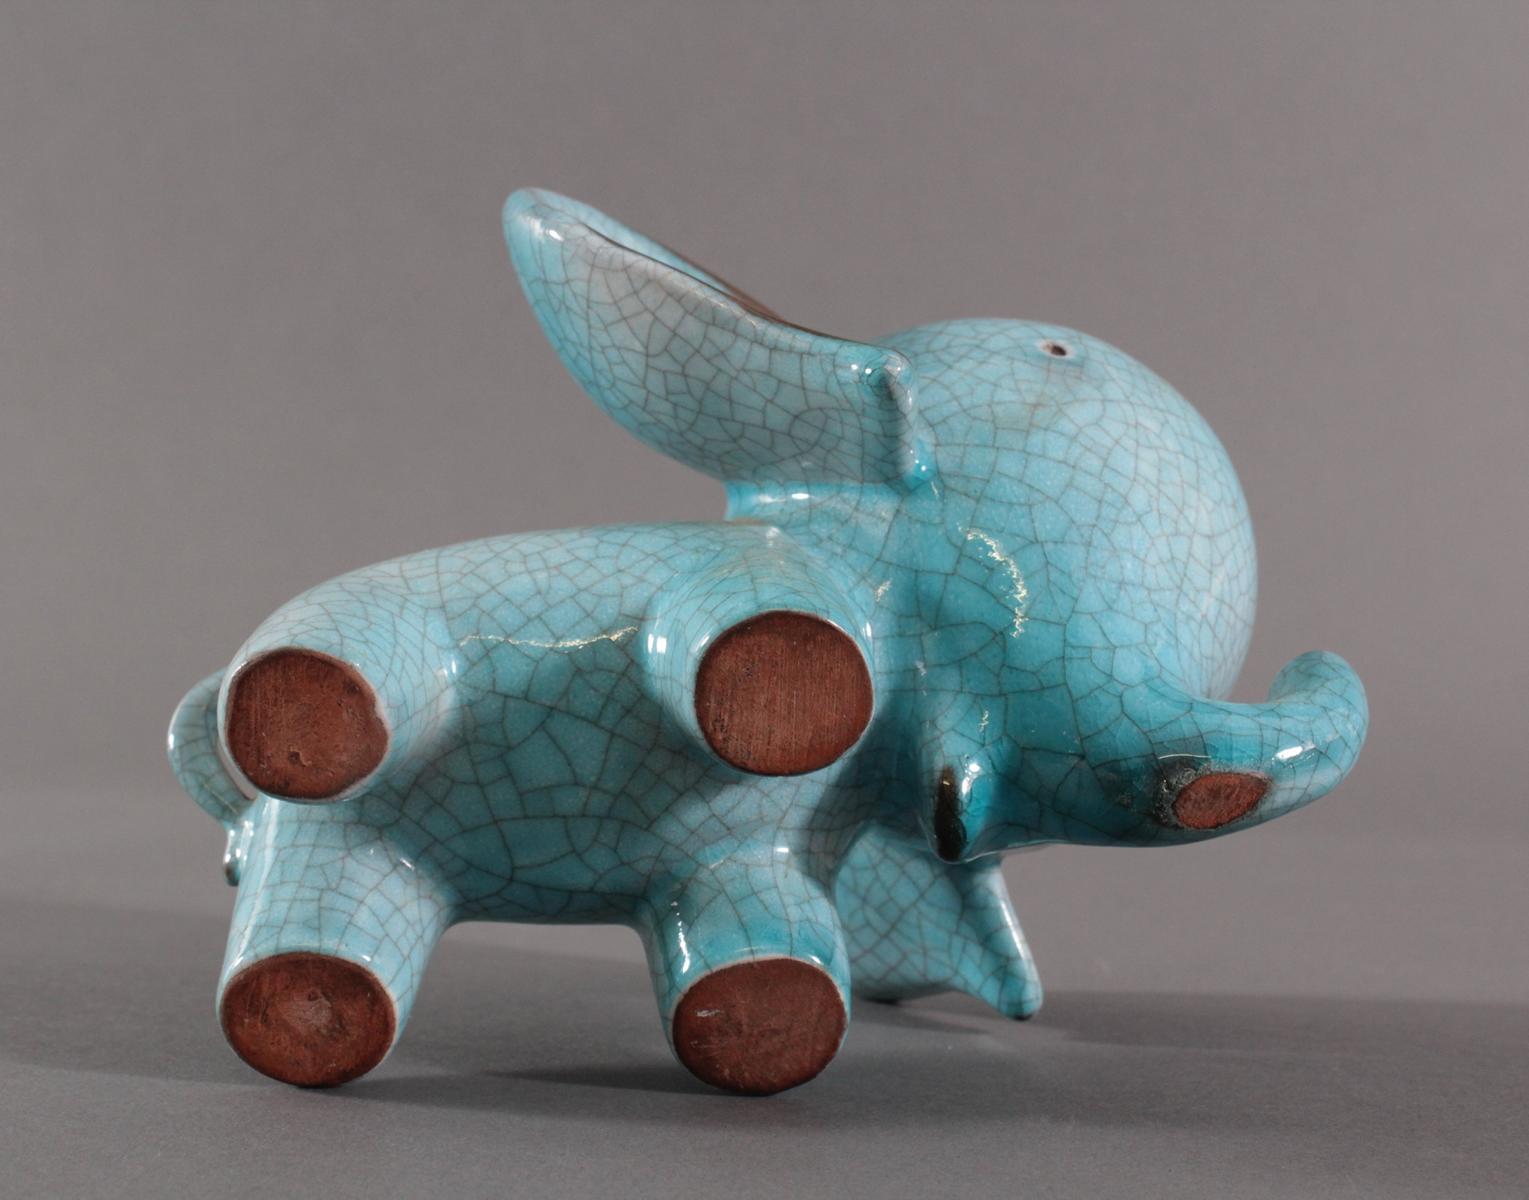 Keramik-Miniaturtierplastik, 'Elefant', Karlsruher Majolika, um 1956-88, Entw.: Walter Bosse-5